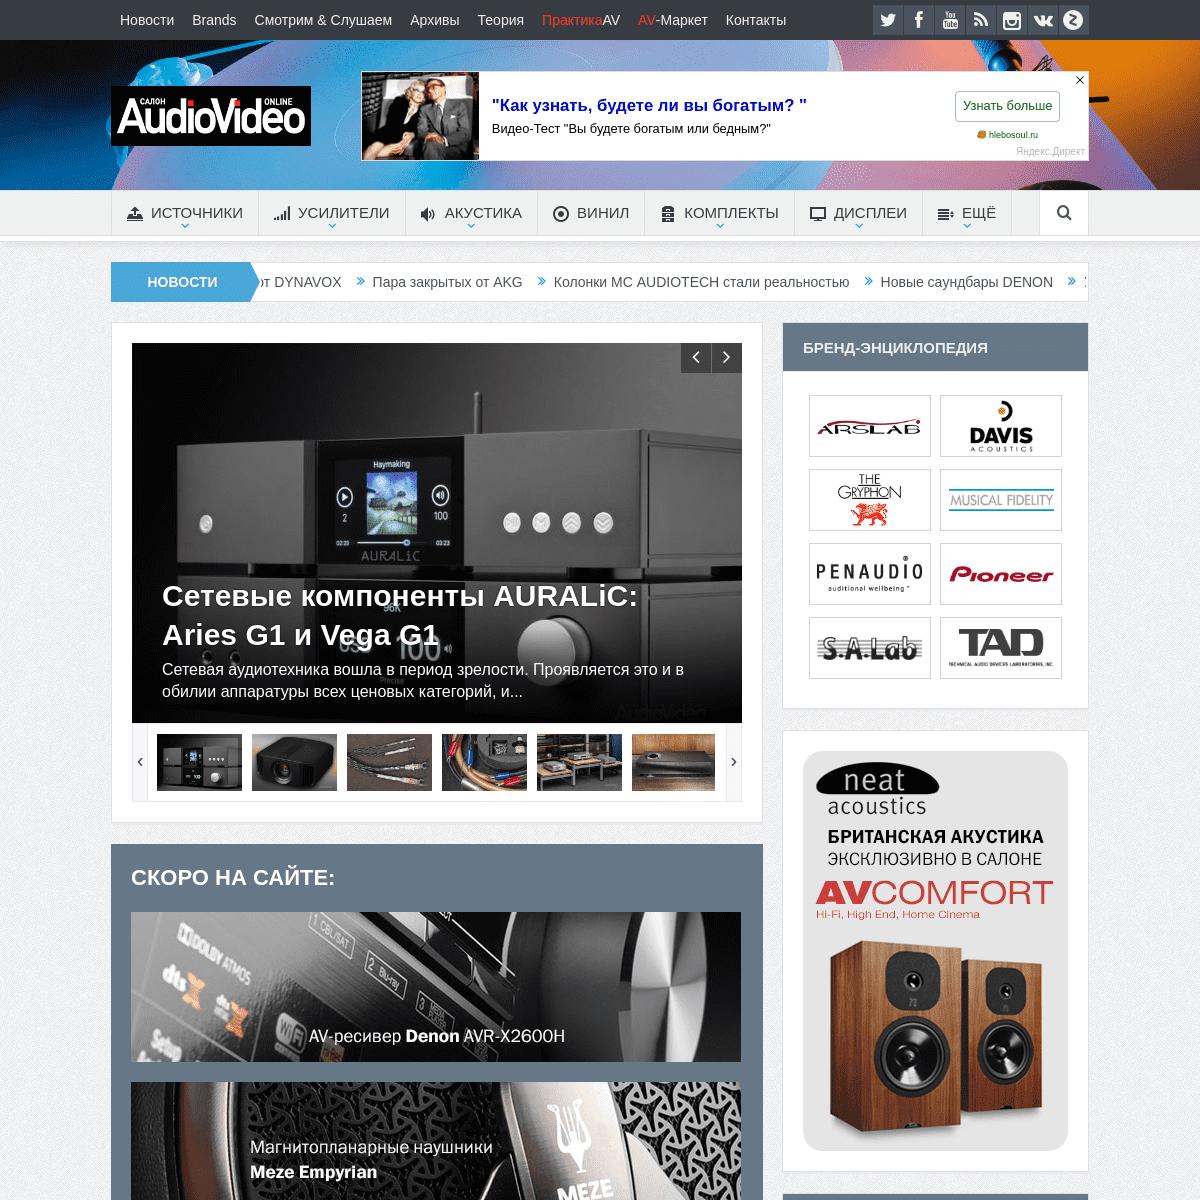 журнал SalonAV - Салон AudioVideo – обзор акустики, аудио- и видеотехники